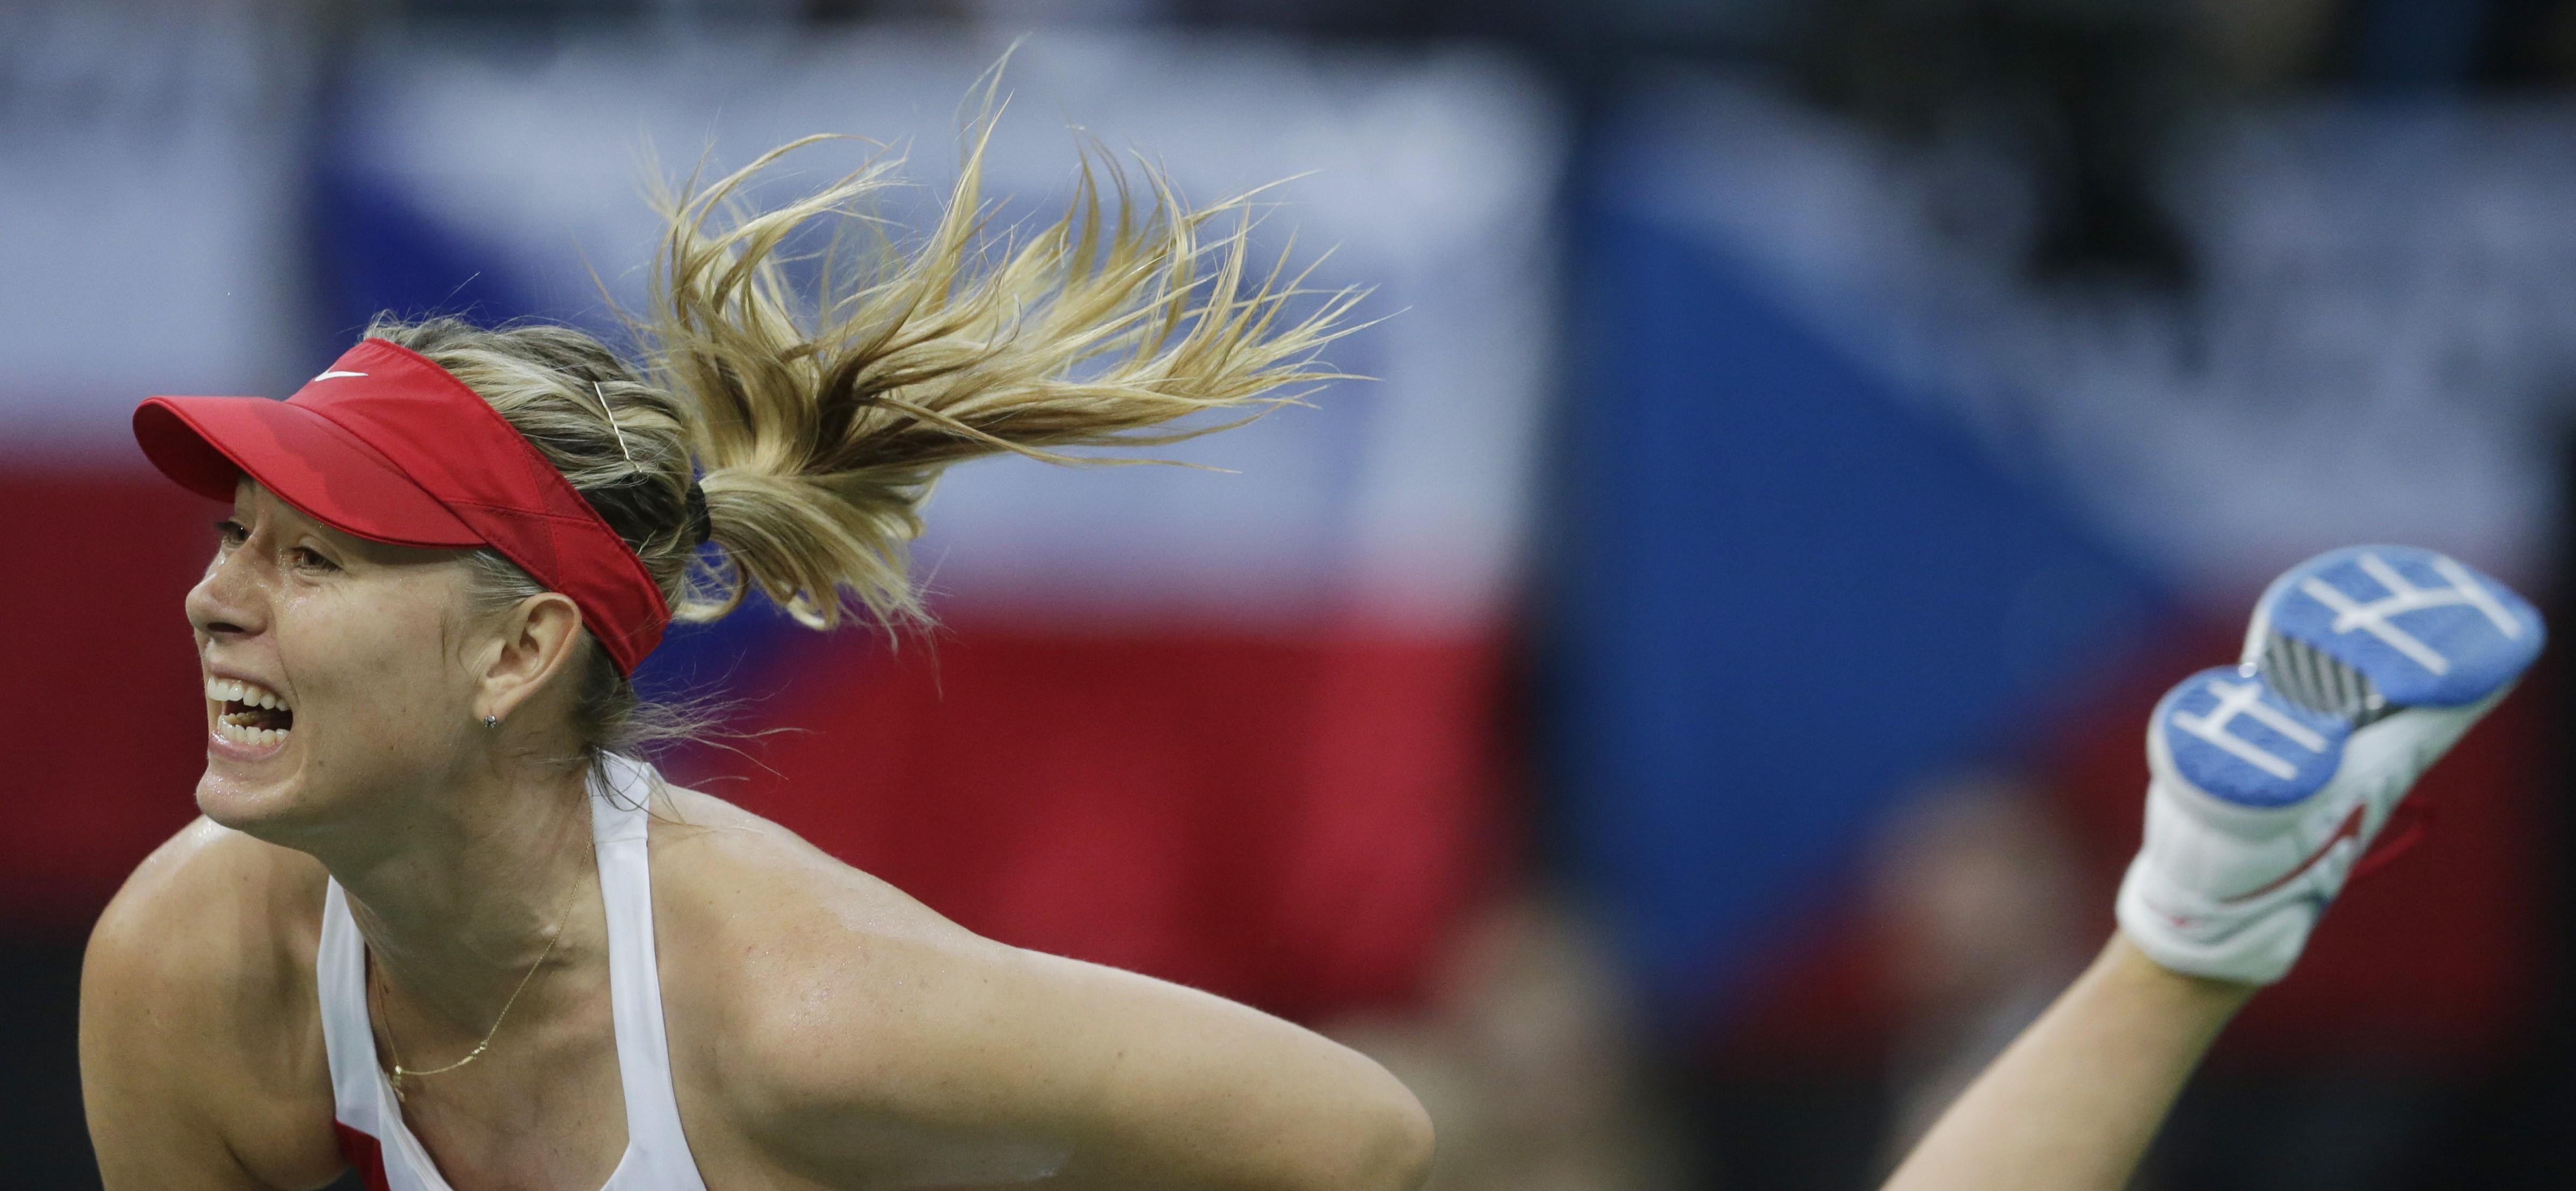 Russia's Maria Sharapova  serves  to Czech Republic's Petra Kvitova during their Fed Cup tennis final match between Czech Republic and Russia in Prague, Czech Republic, Sunday, Nov. 15, 2015. (AP Photo/Petr David Josek)